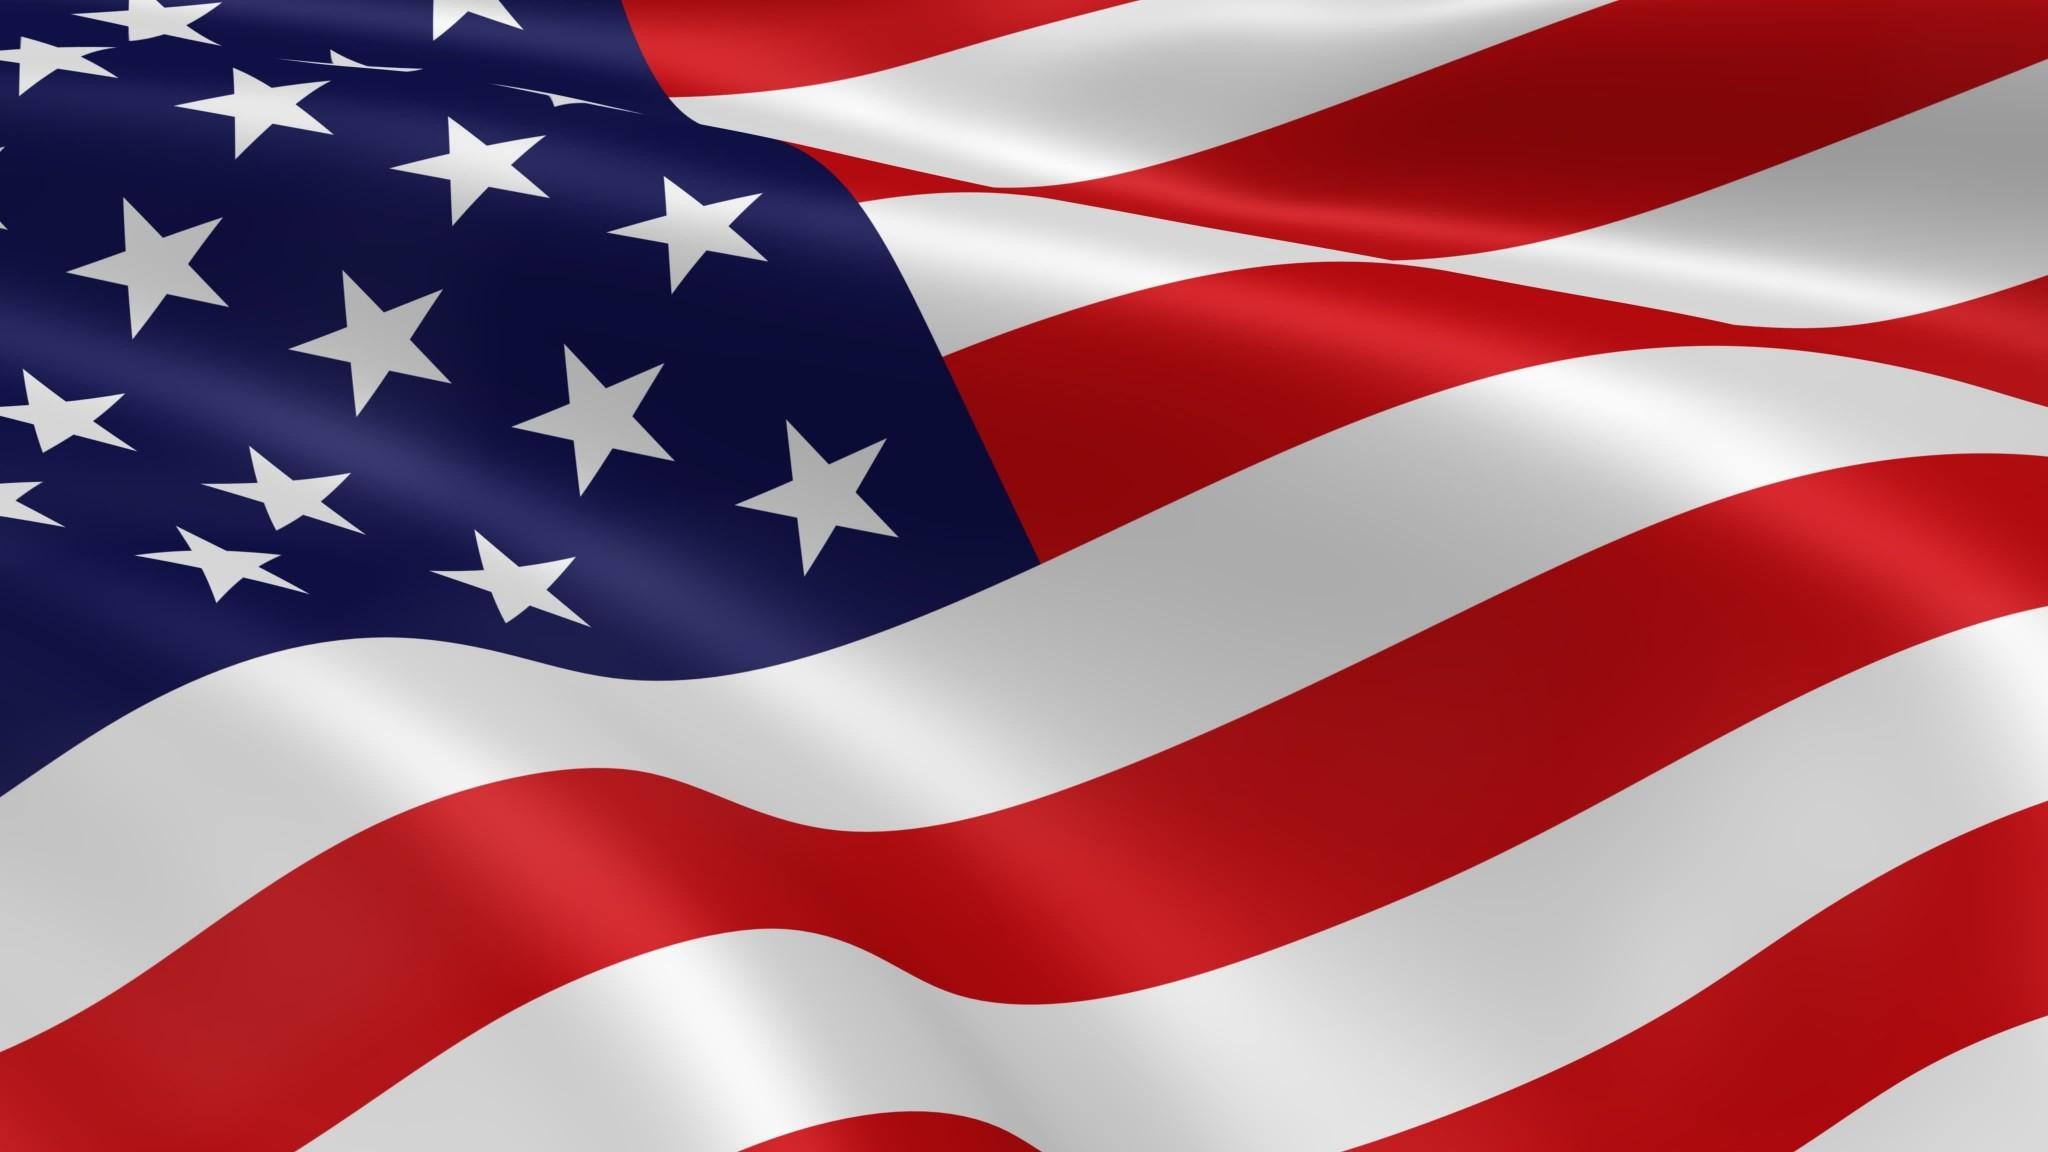 american flag wallpaper desktop backgrounds